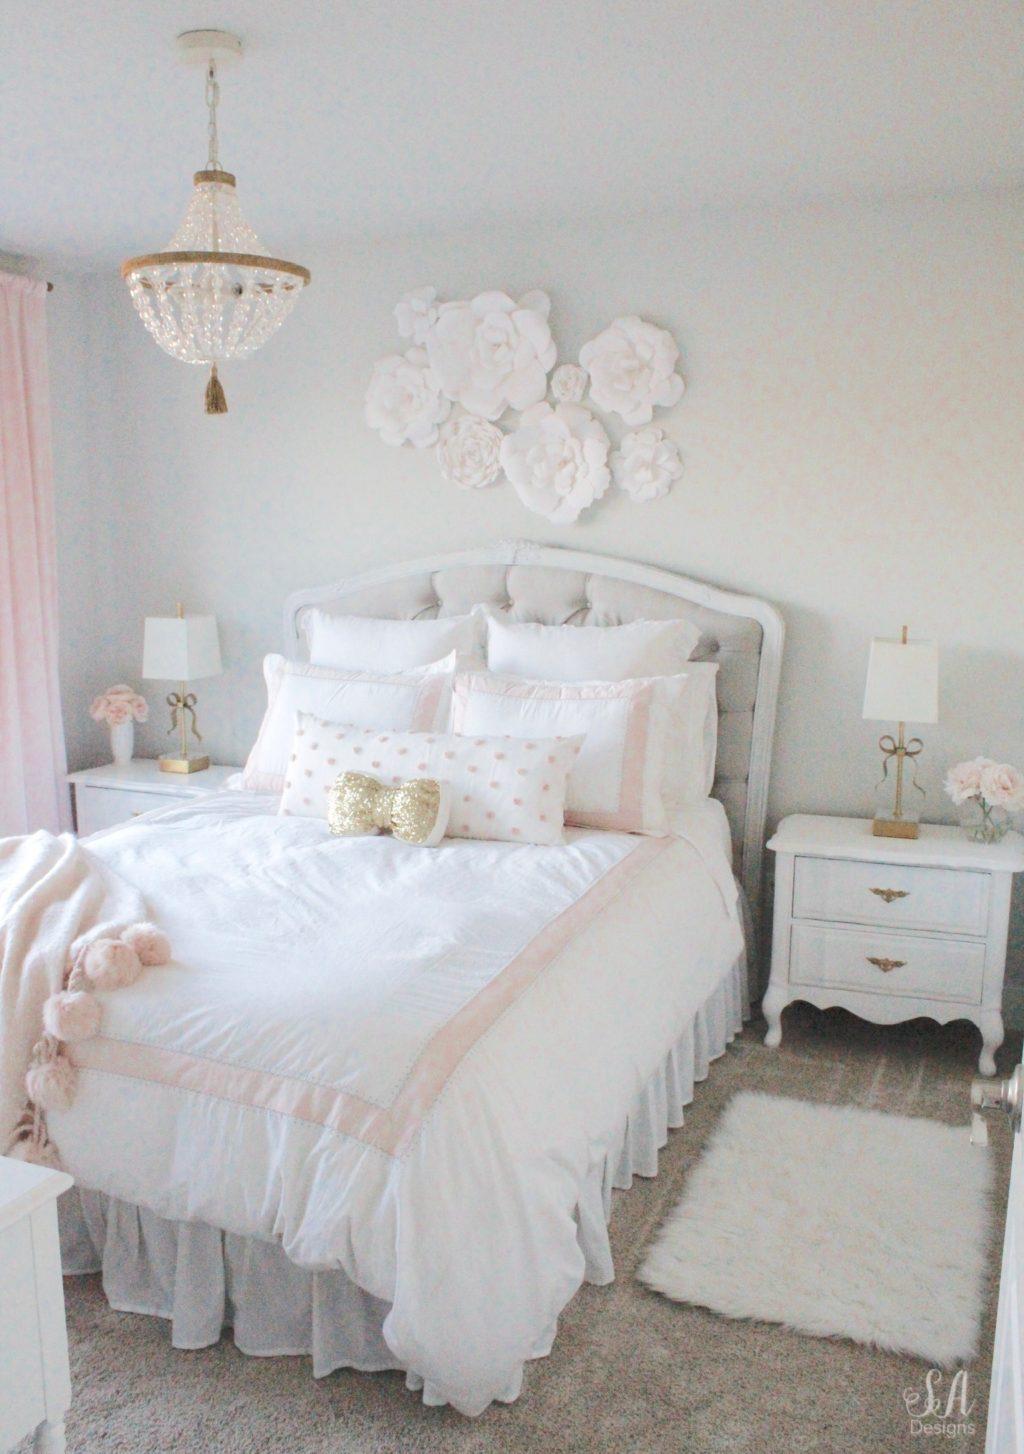 Blush Bedroom, Blush And Gold, Blush Gold Grey, Modern Vintage Style, Modern